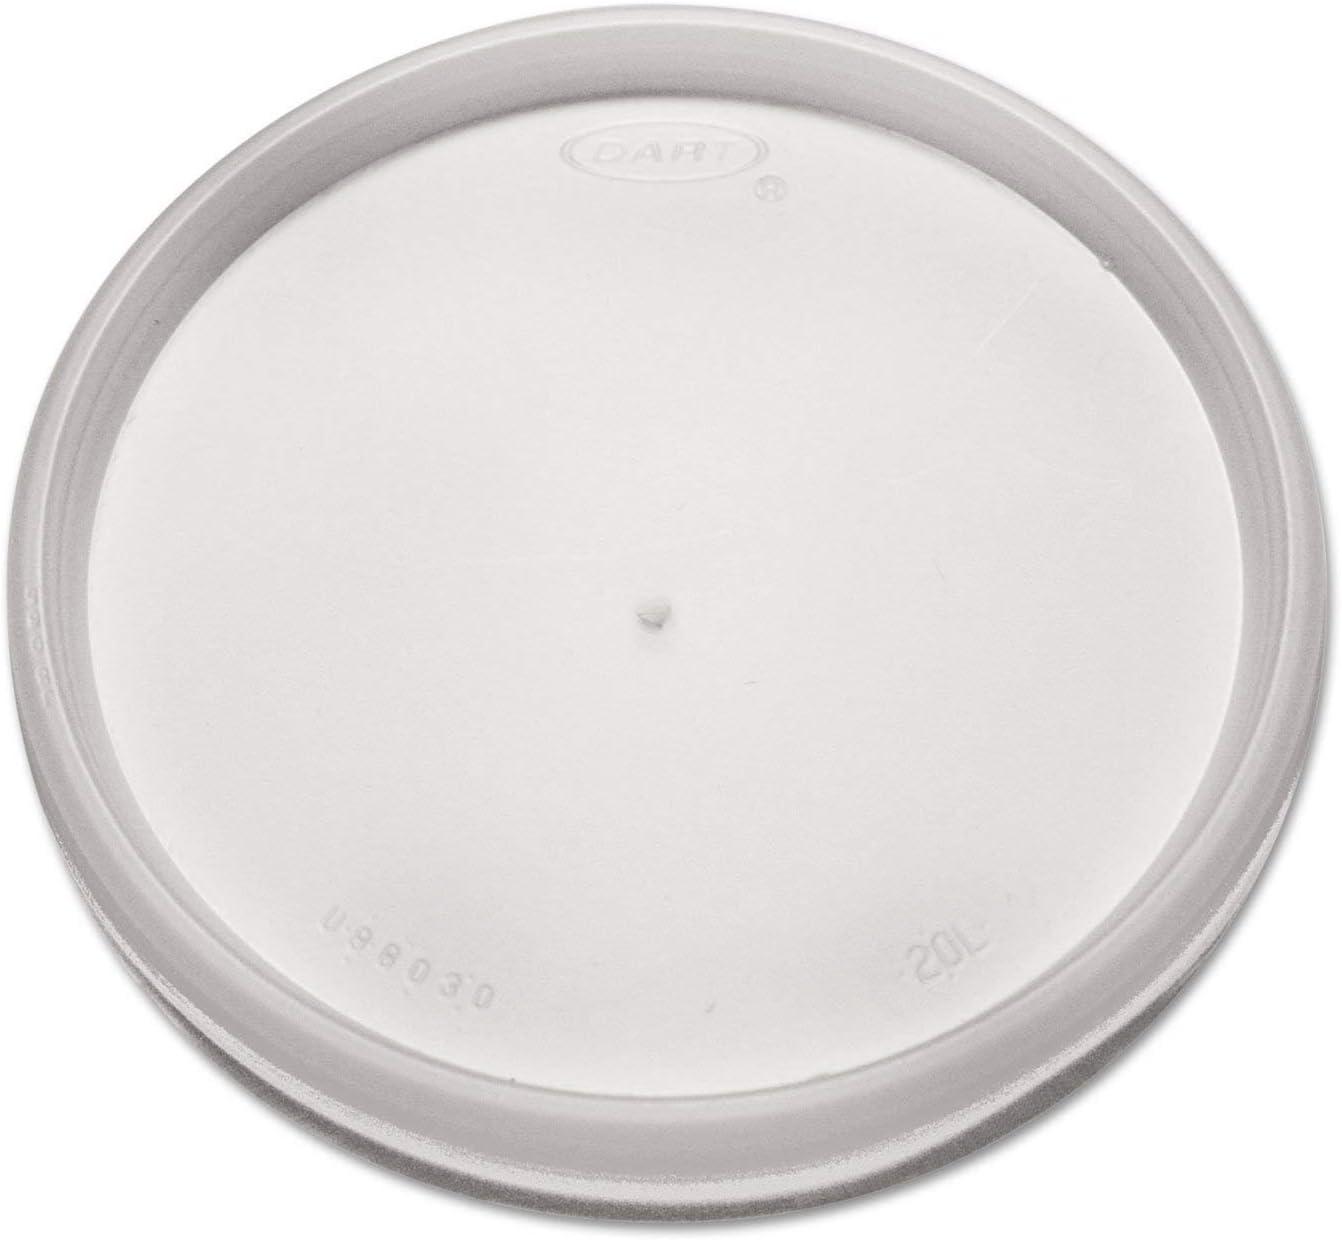 DART 20JL Plastic Lids for 8 12 16oz Hot/Cold Foam Cups Vented 1000/Carton